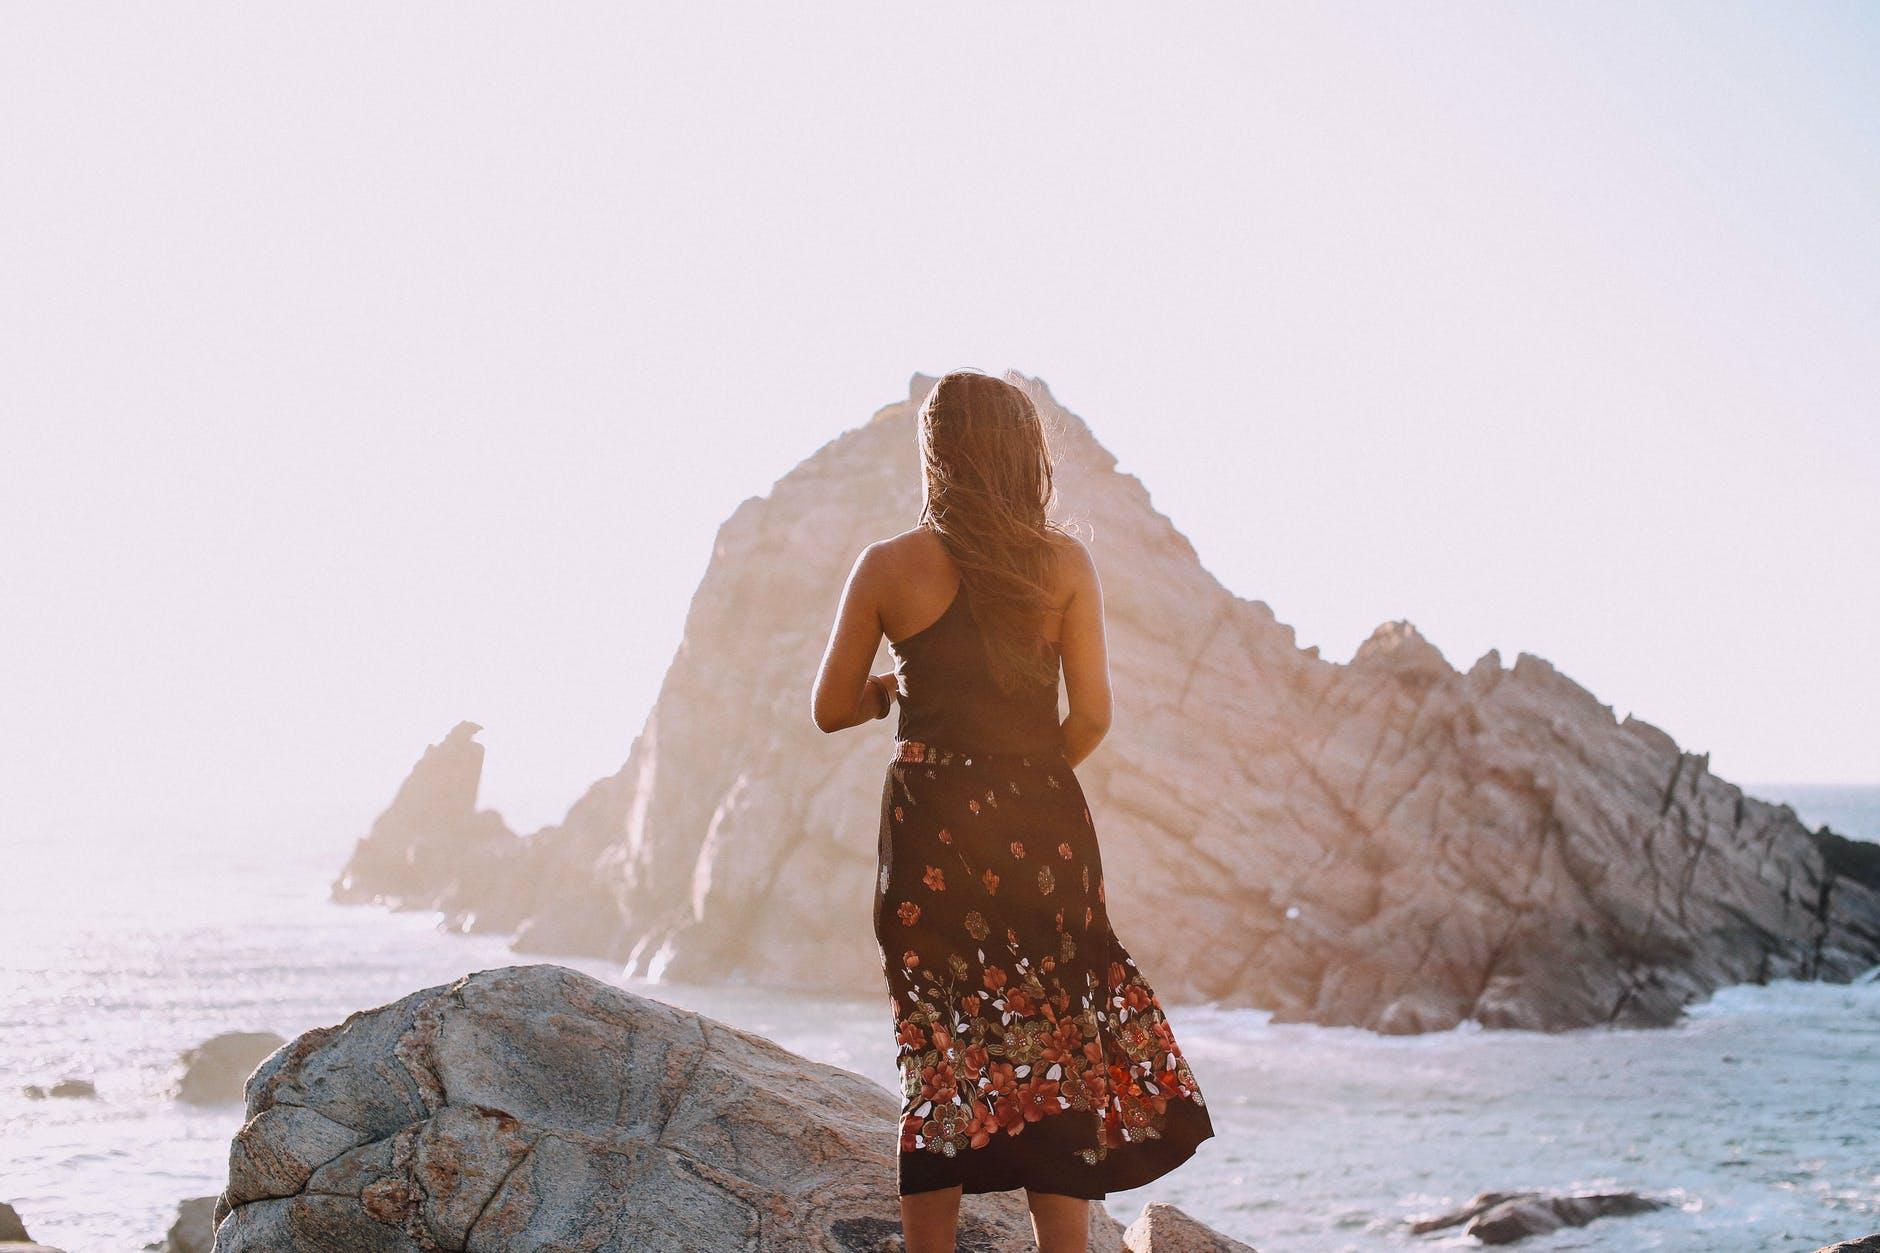 unrecognizable stylish woman standing on rocky seashore